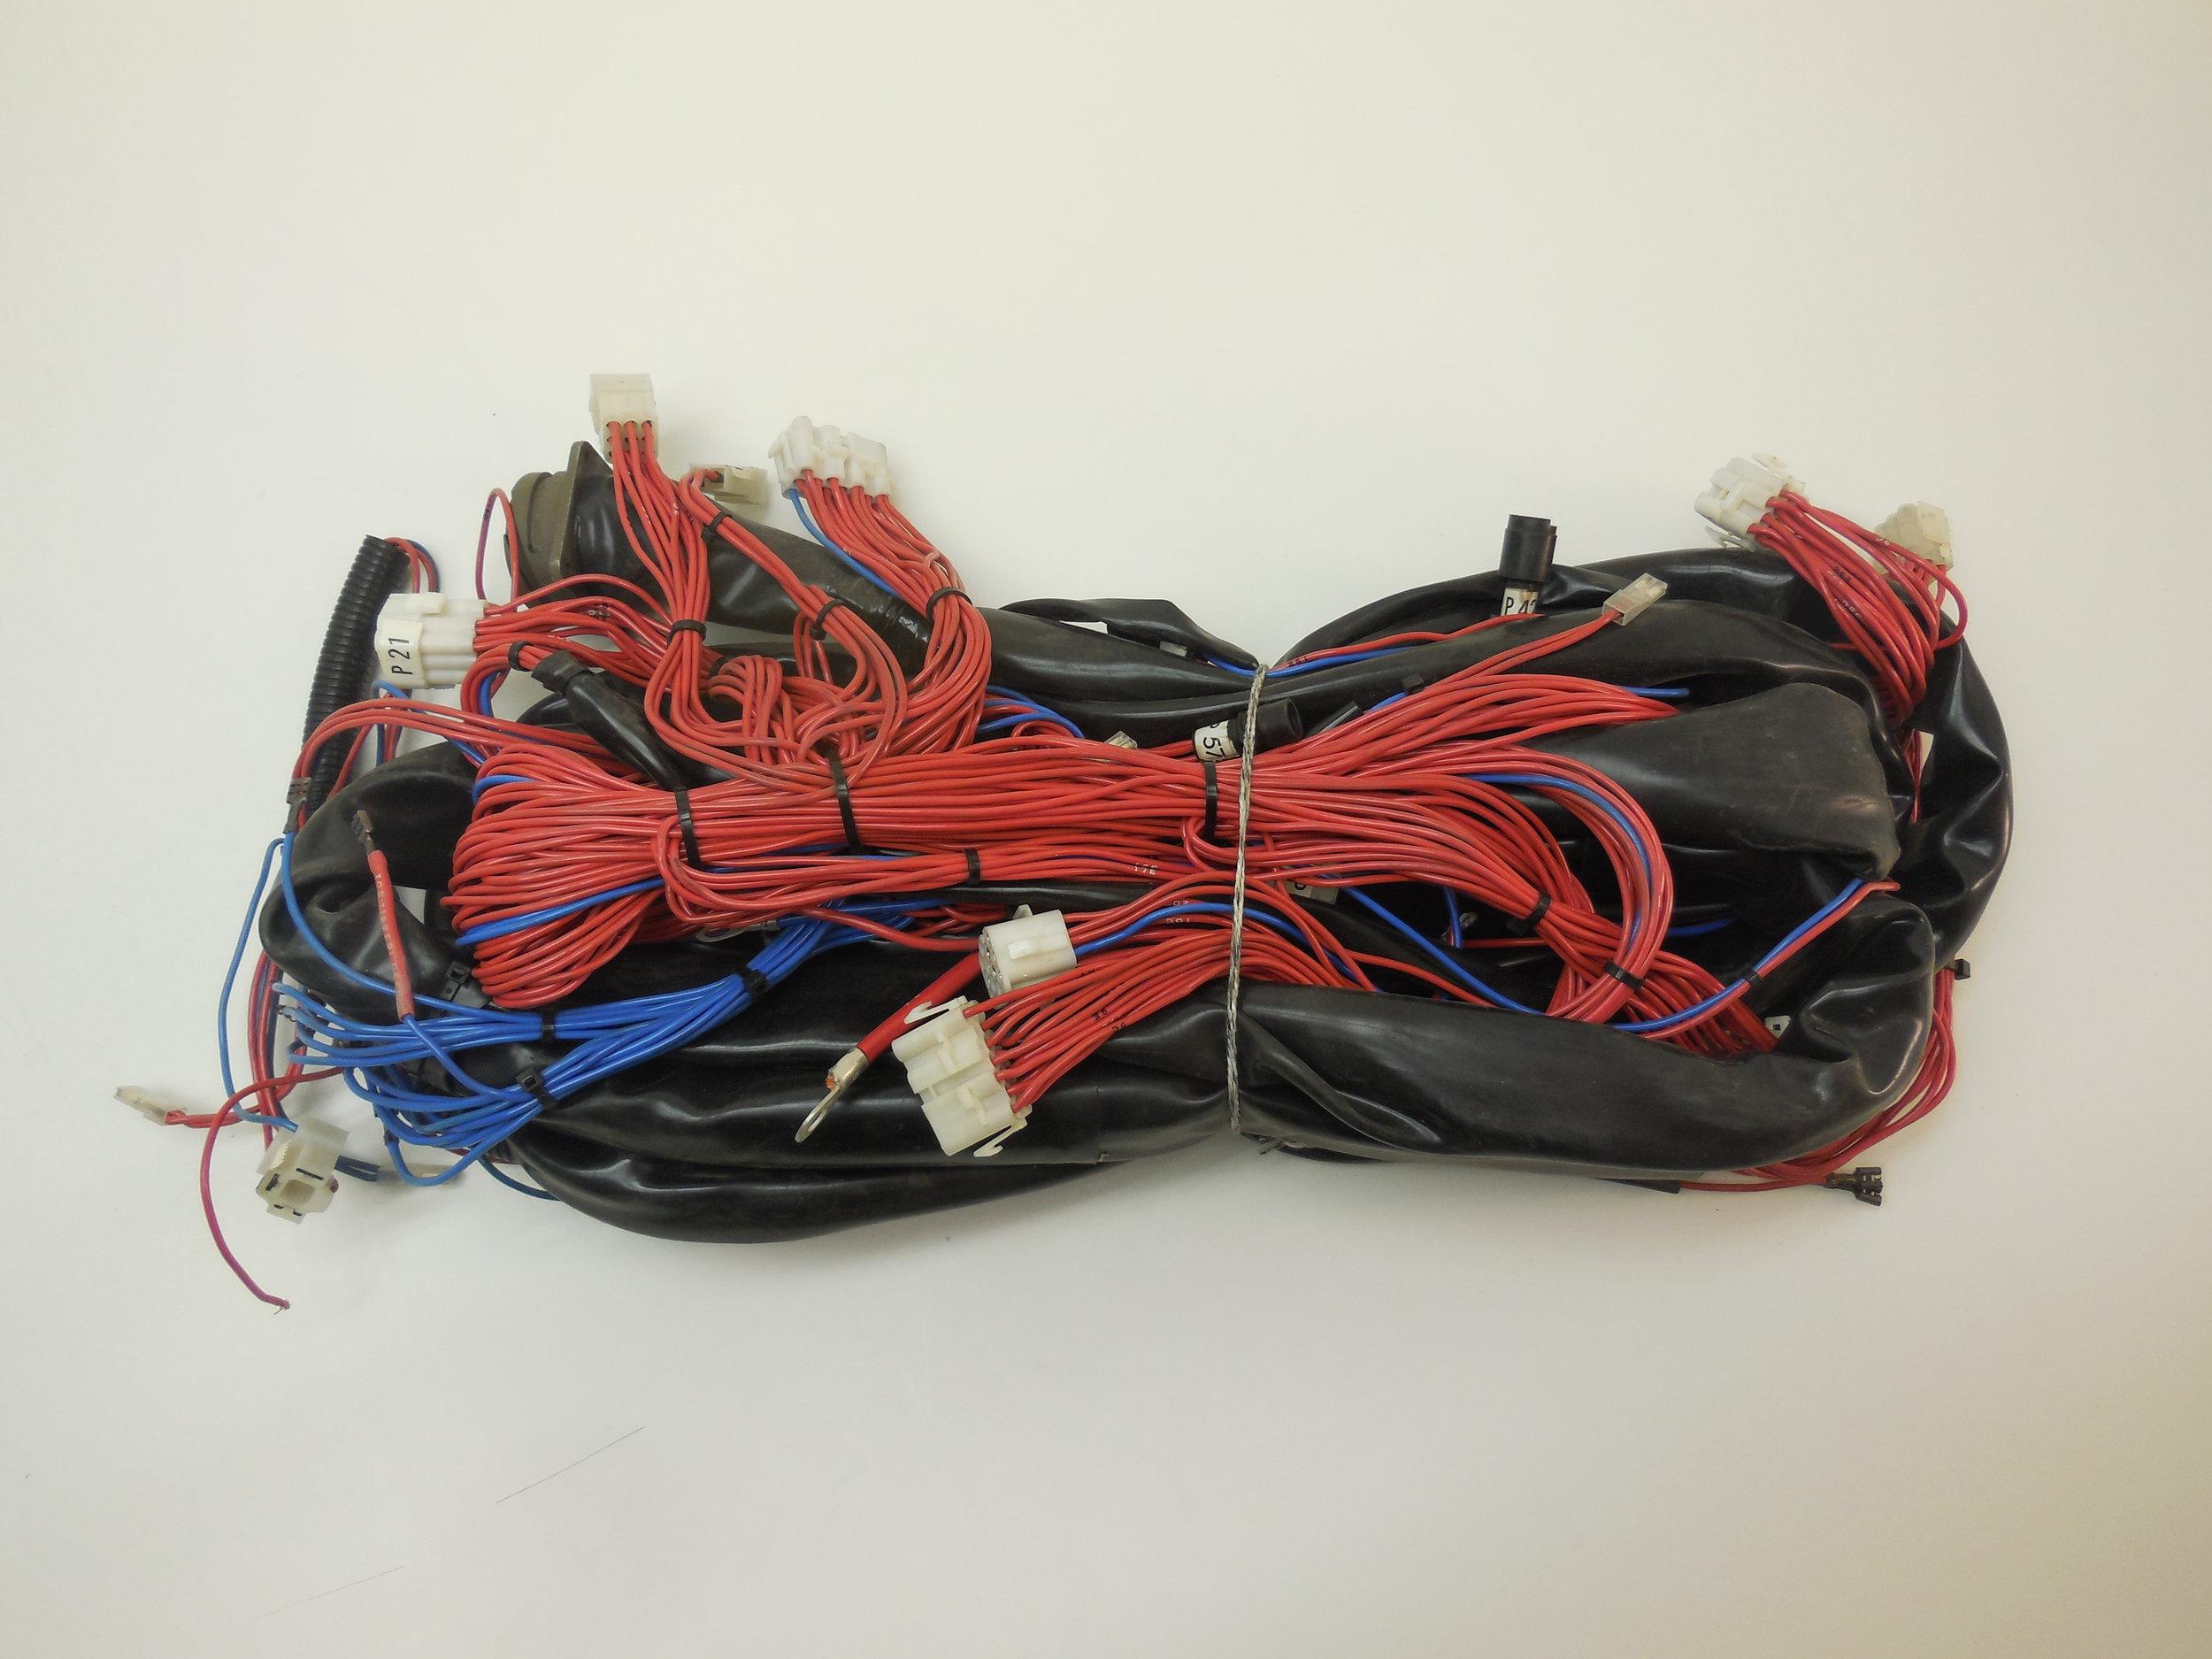 Cabling, dashboard bv D6   Häggo nr: 153 6511-801 Price: